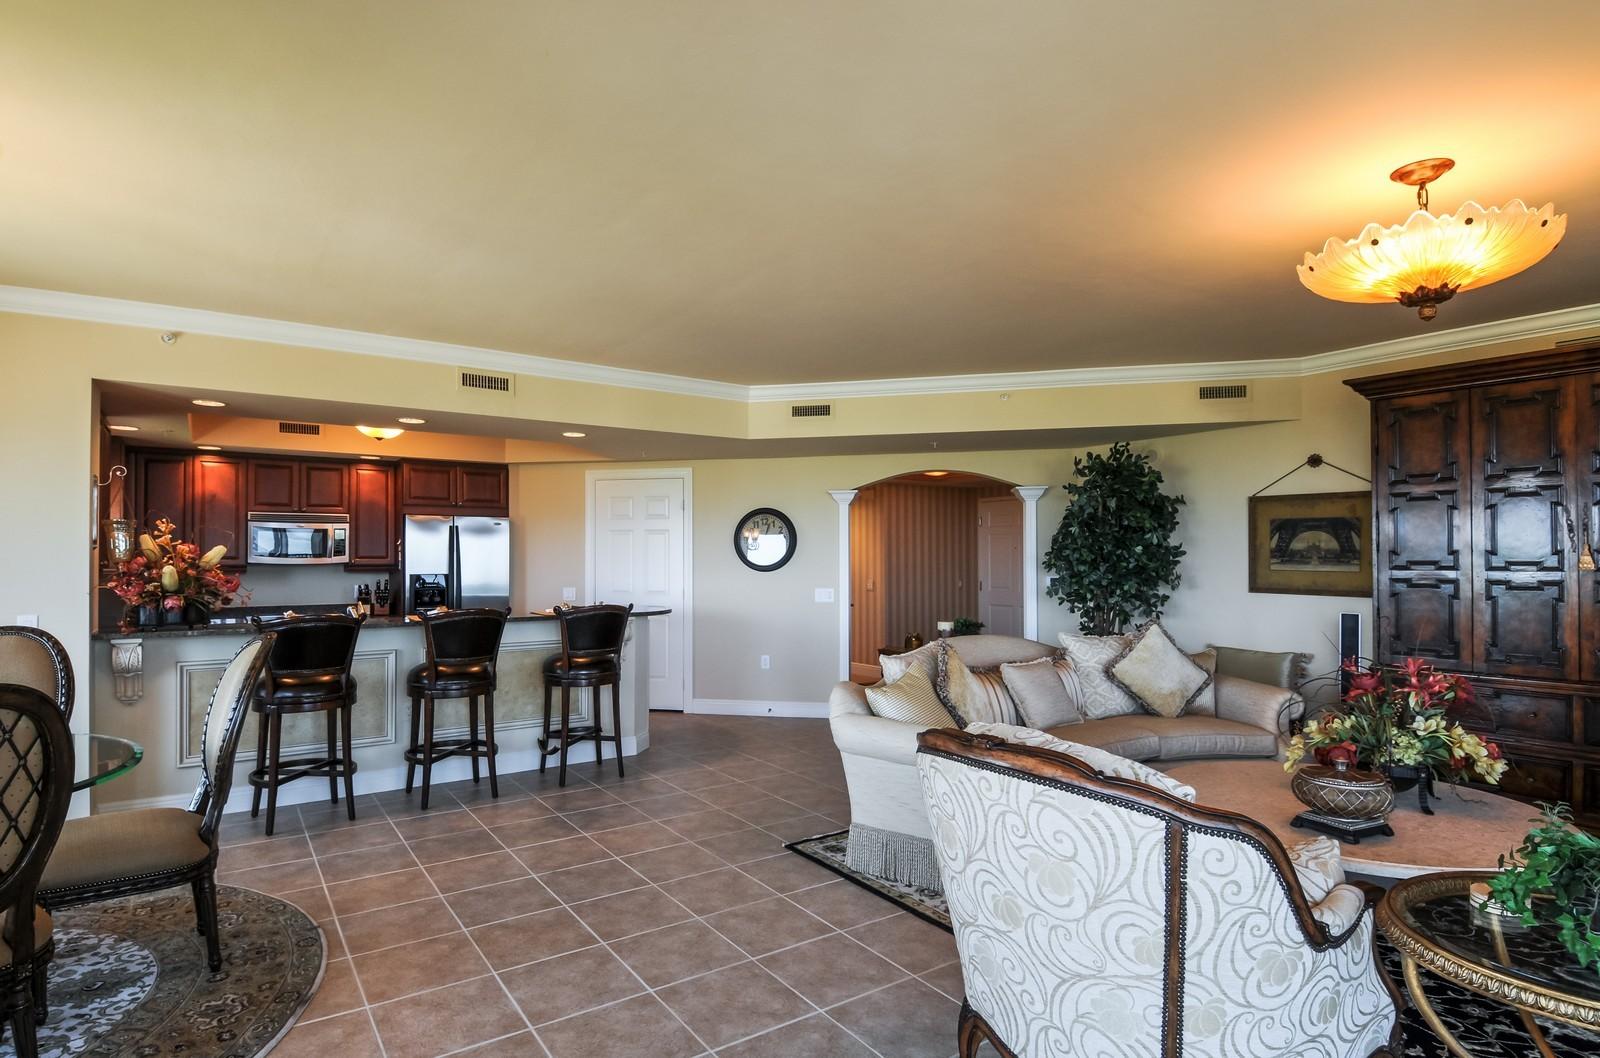 Real Estate Photography - 23540 Via Veneto, Unit 1705, Bonita Springs, FL, 34134 - Kitchen / Living Room